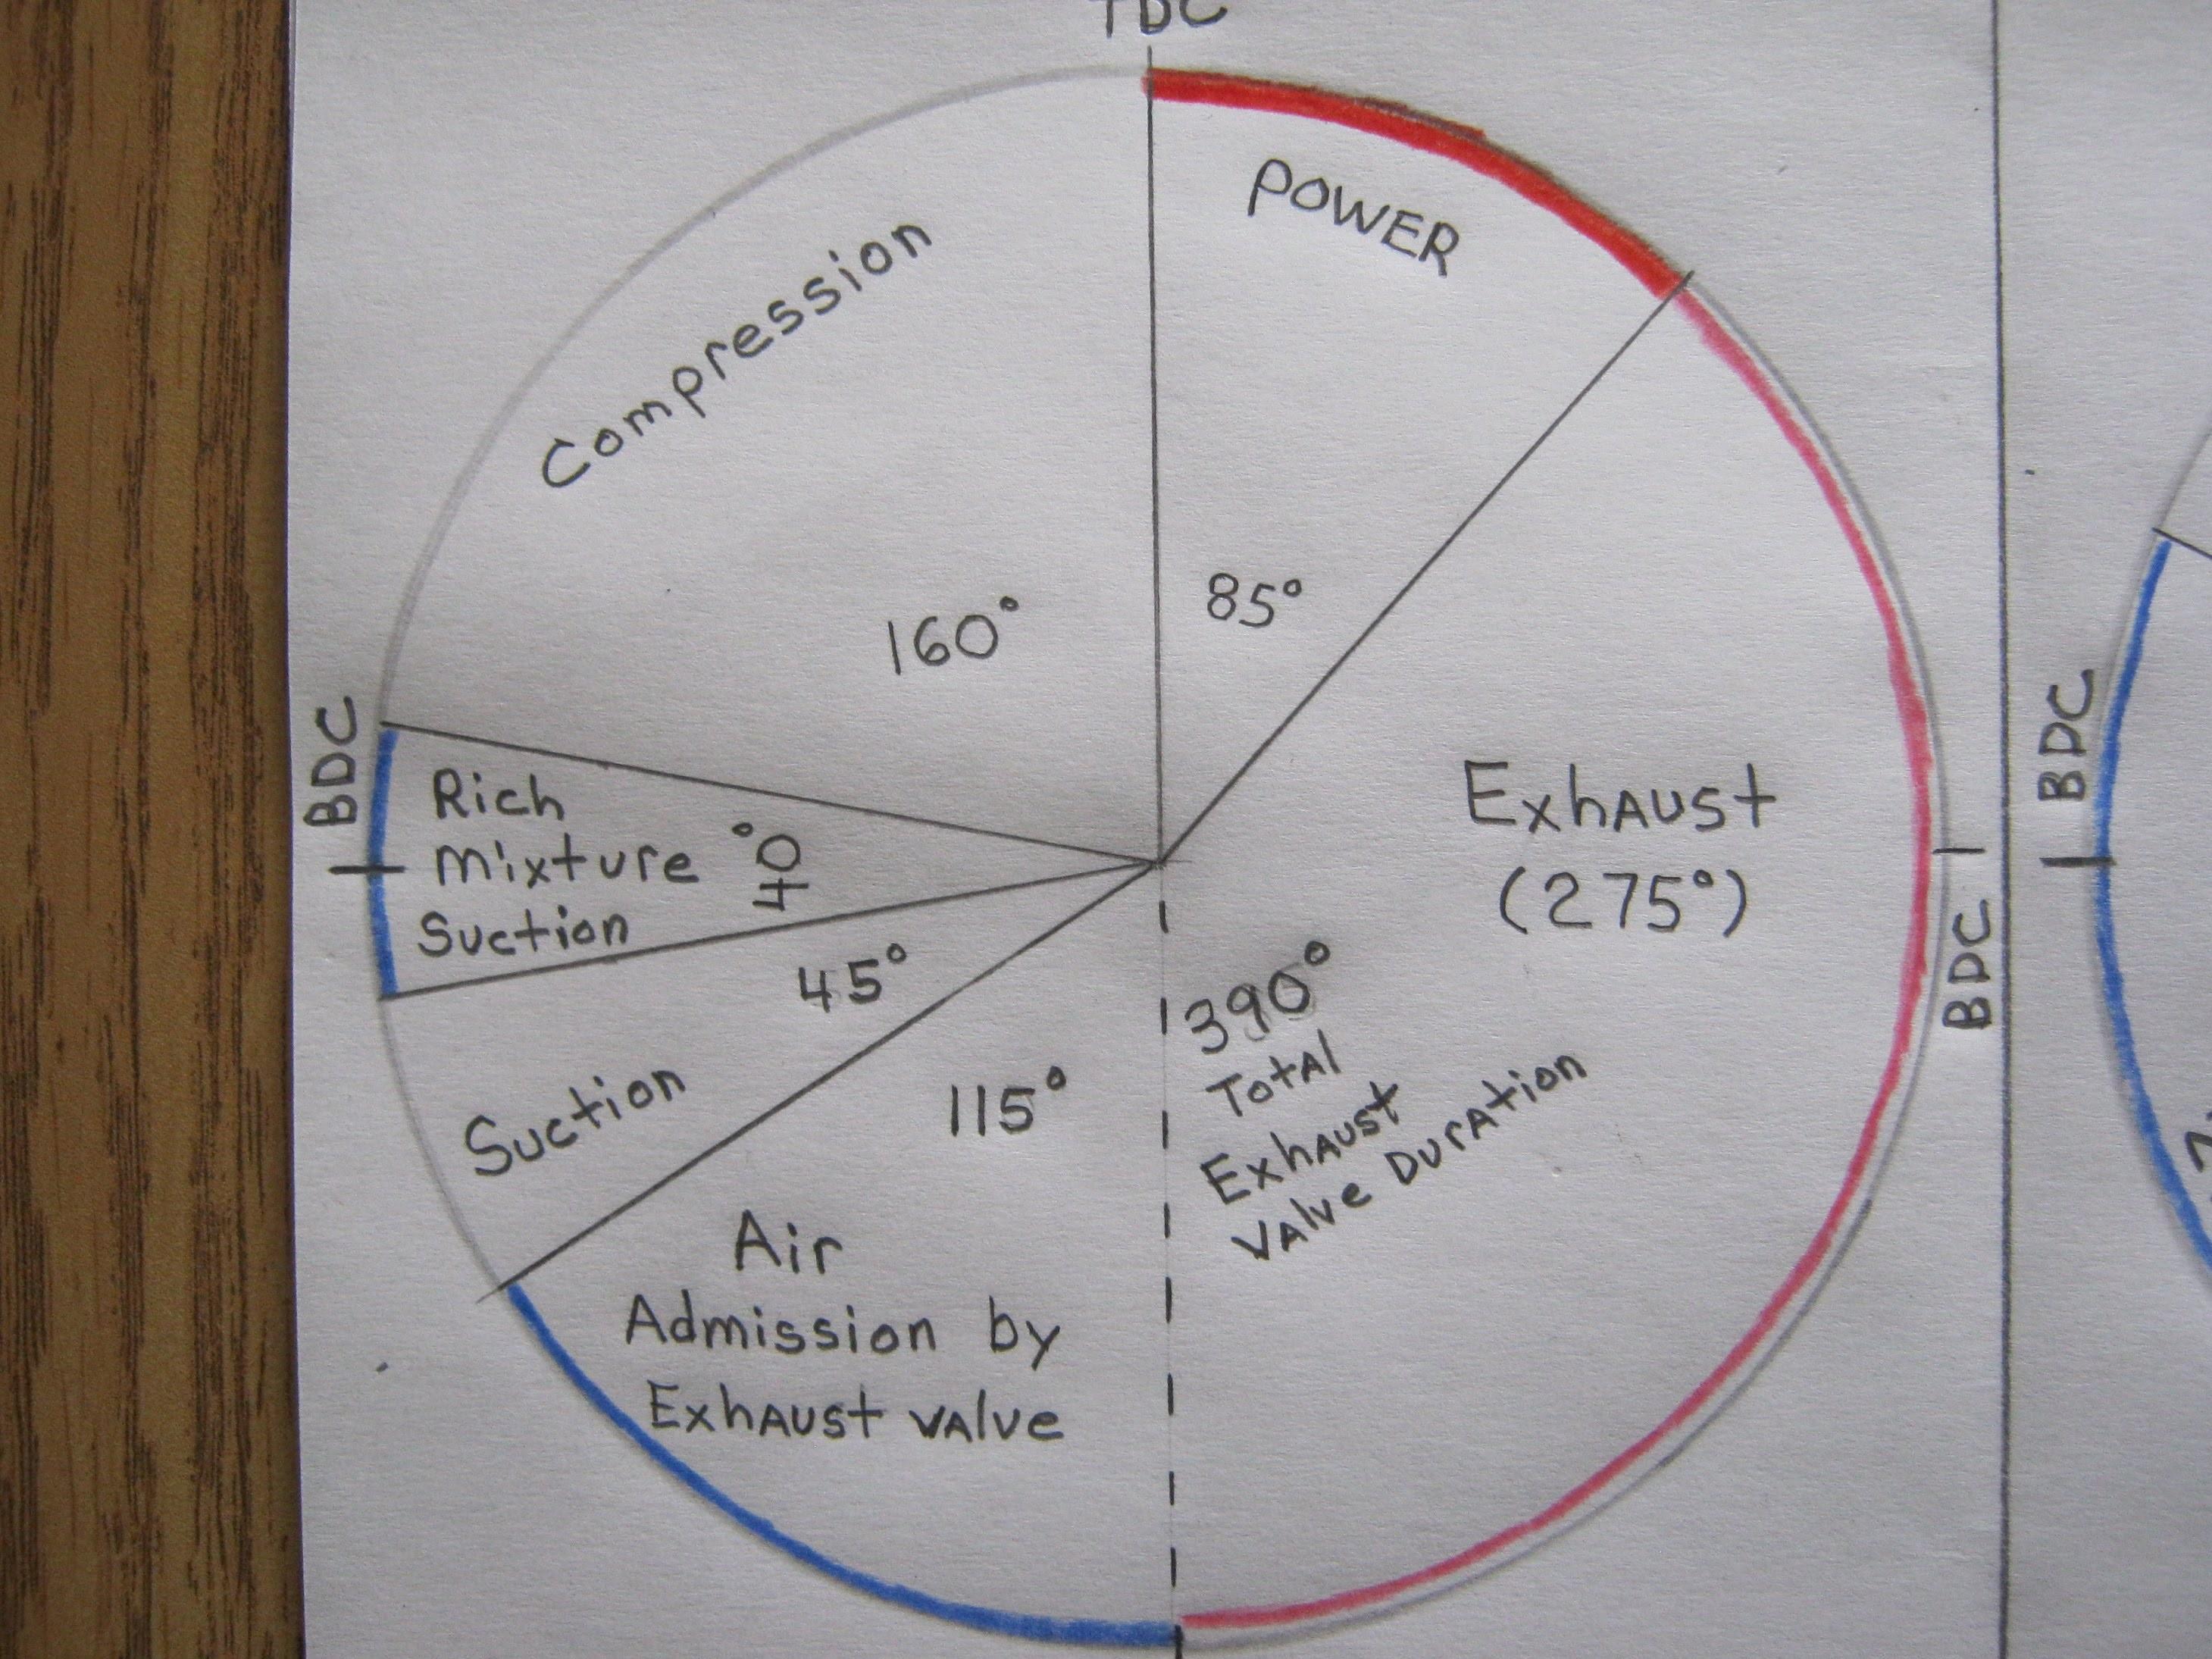 Valve Timing Diagram Of Ic Engine Monosoupape Briggs Details & Valve Timing Diagram